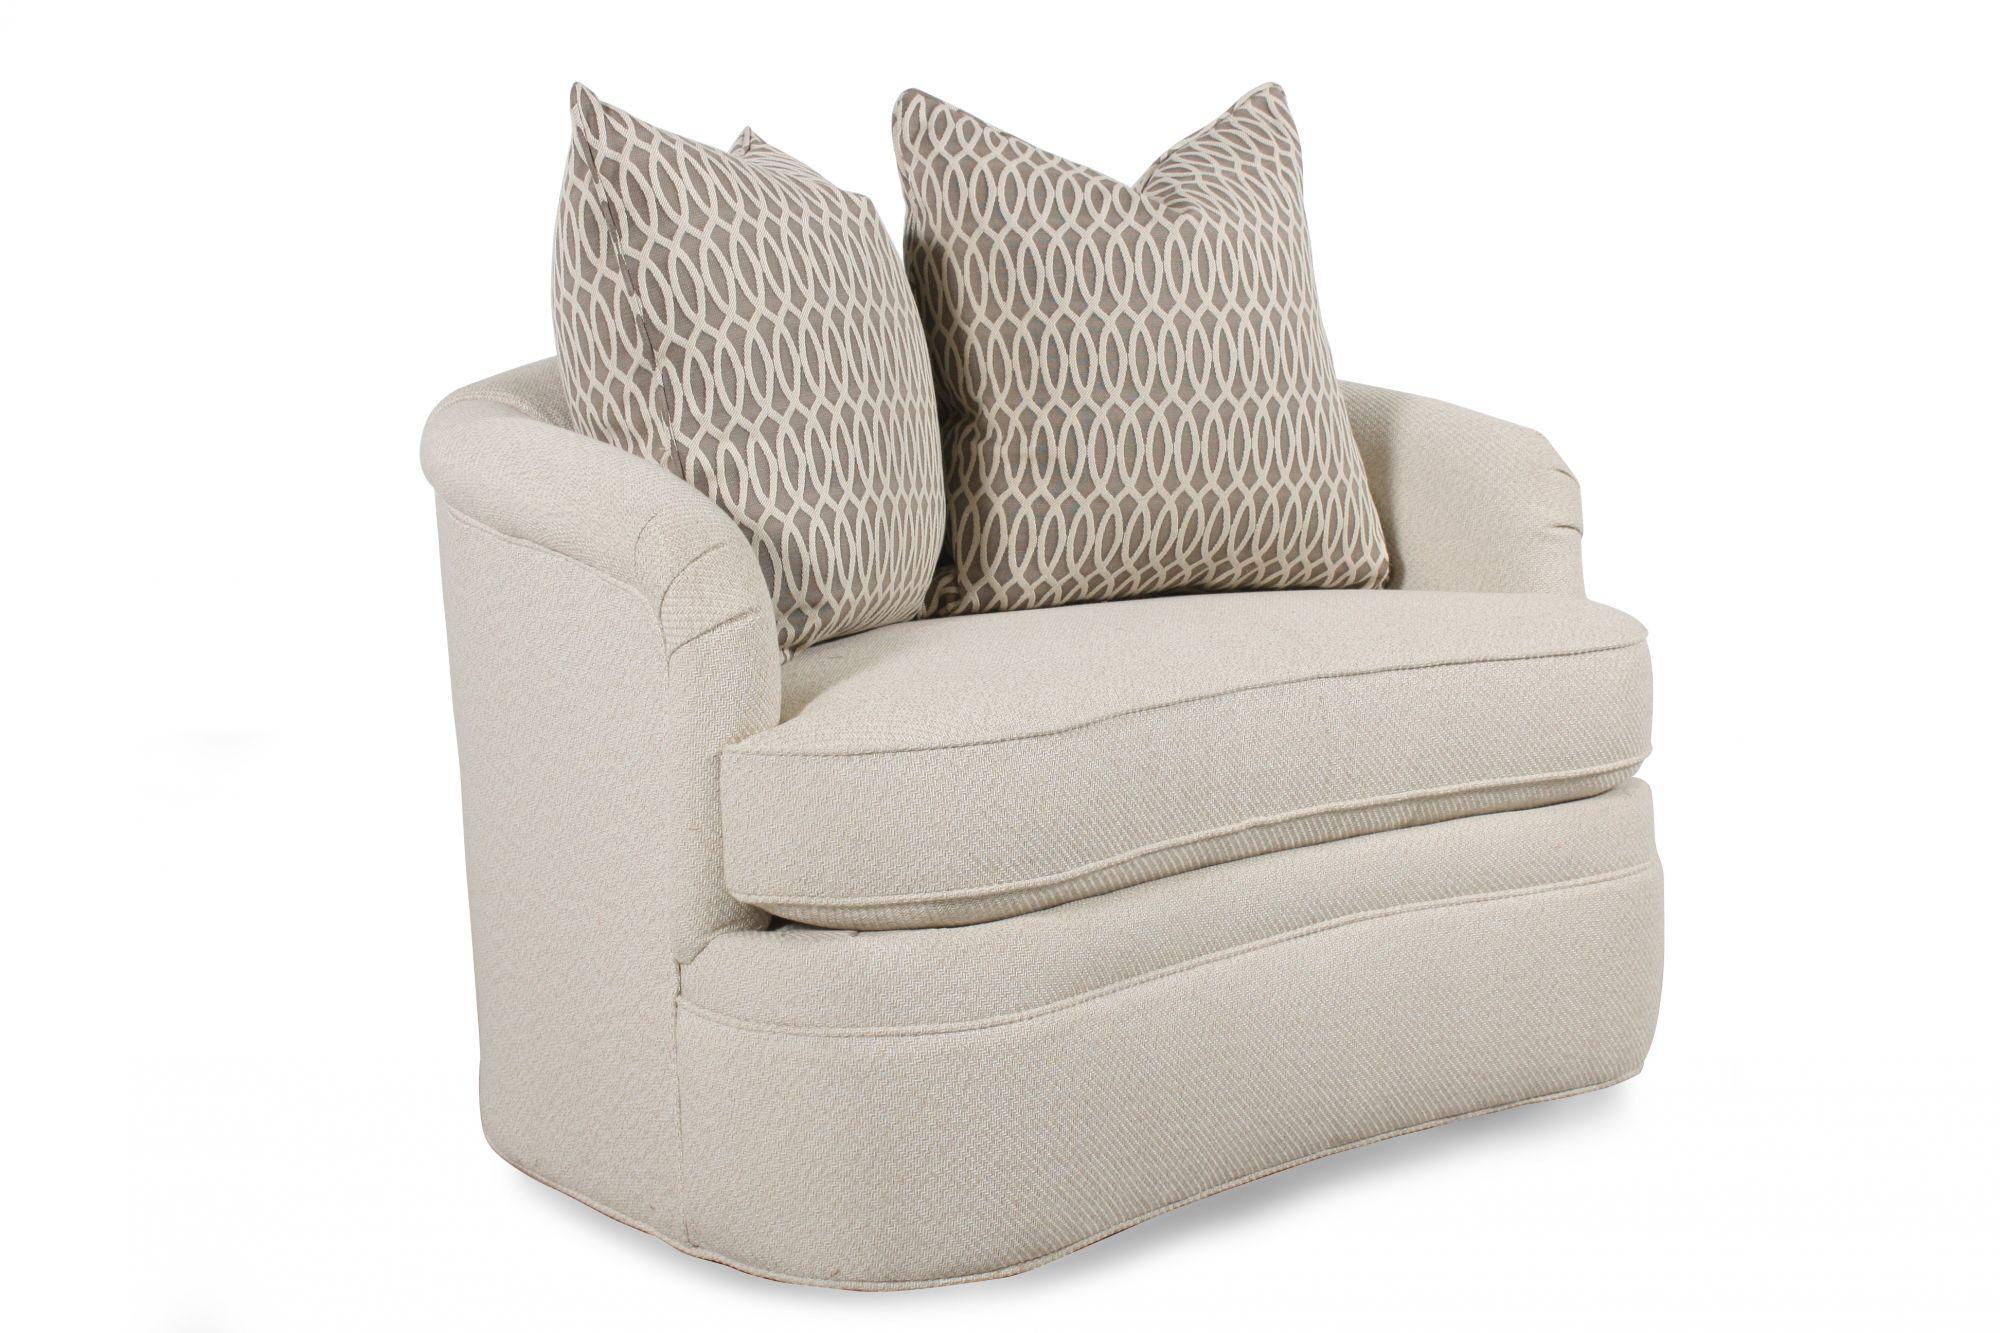 Barrel Style Swivel Chair In Cream